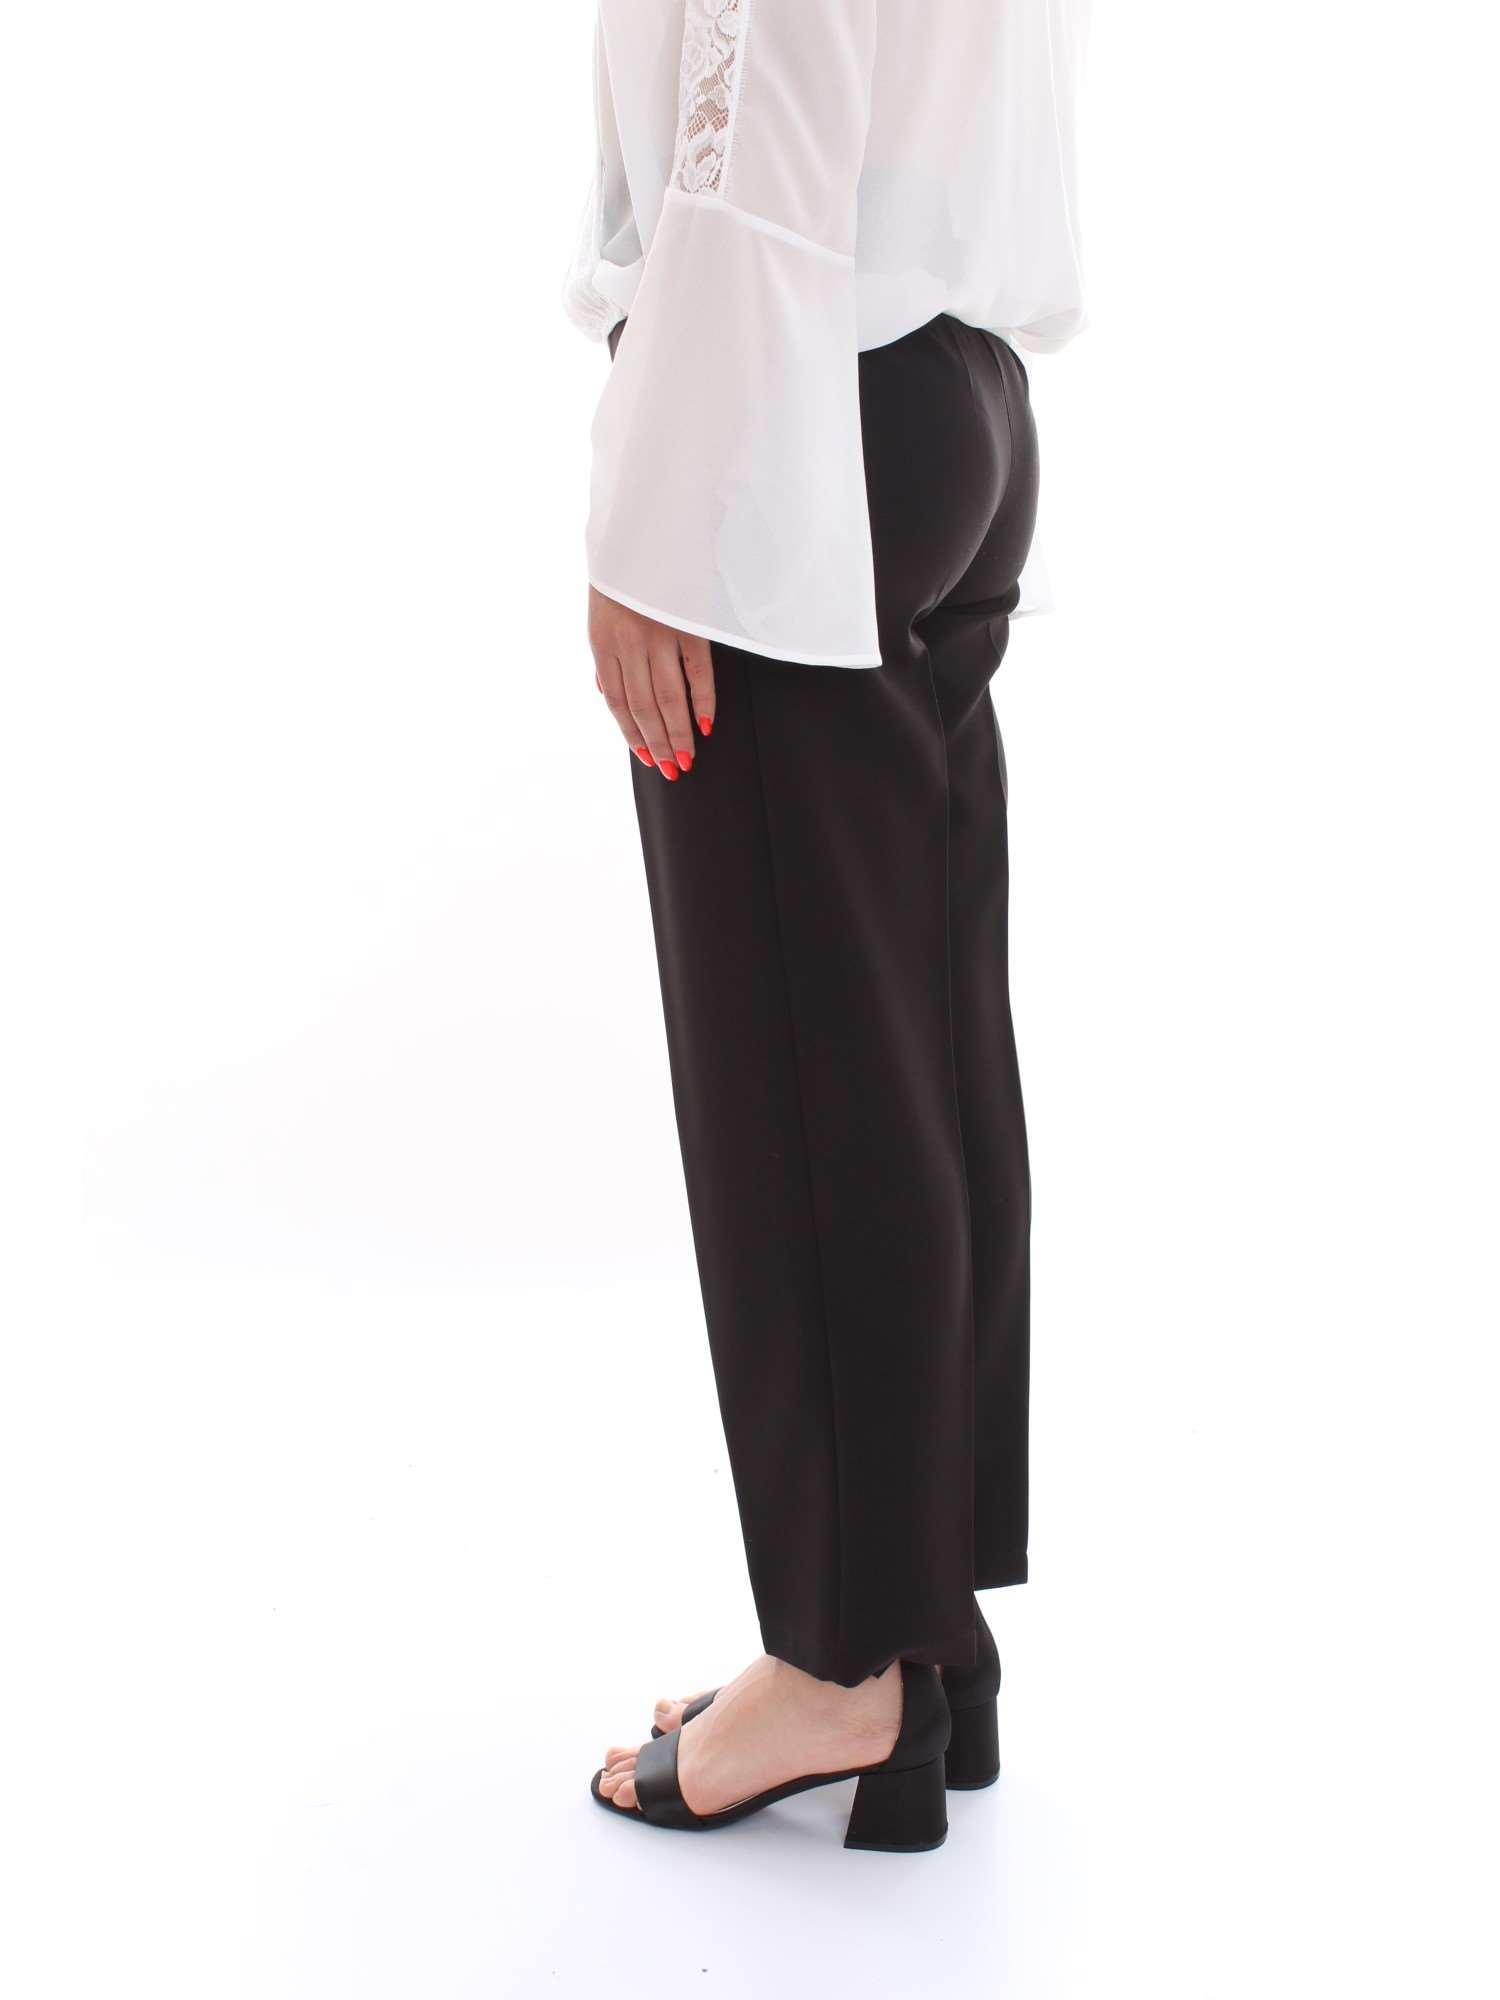 H2o Pants Été Printemps Black Palm Femme U6xrU8qS